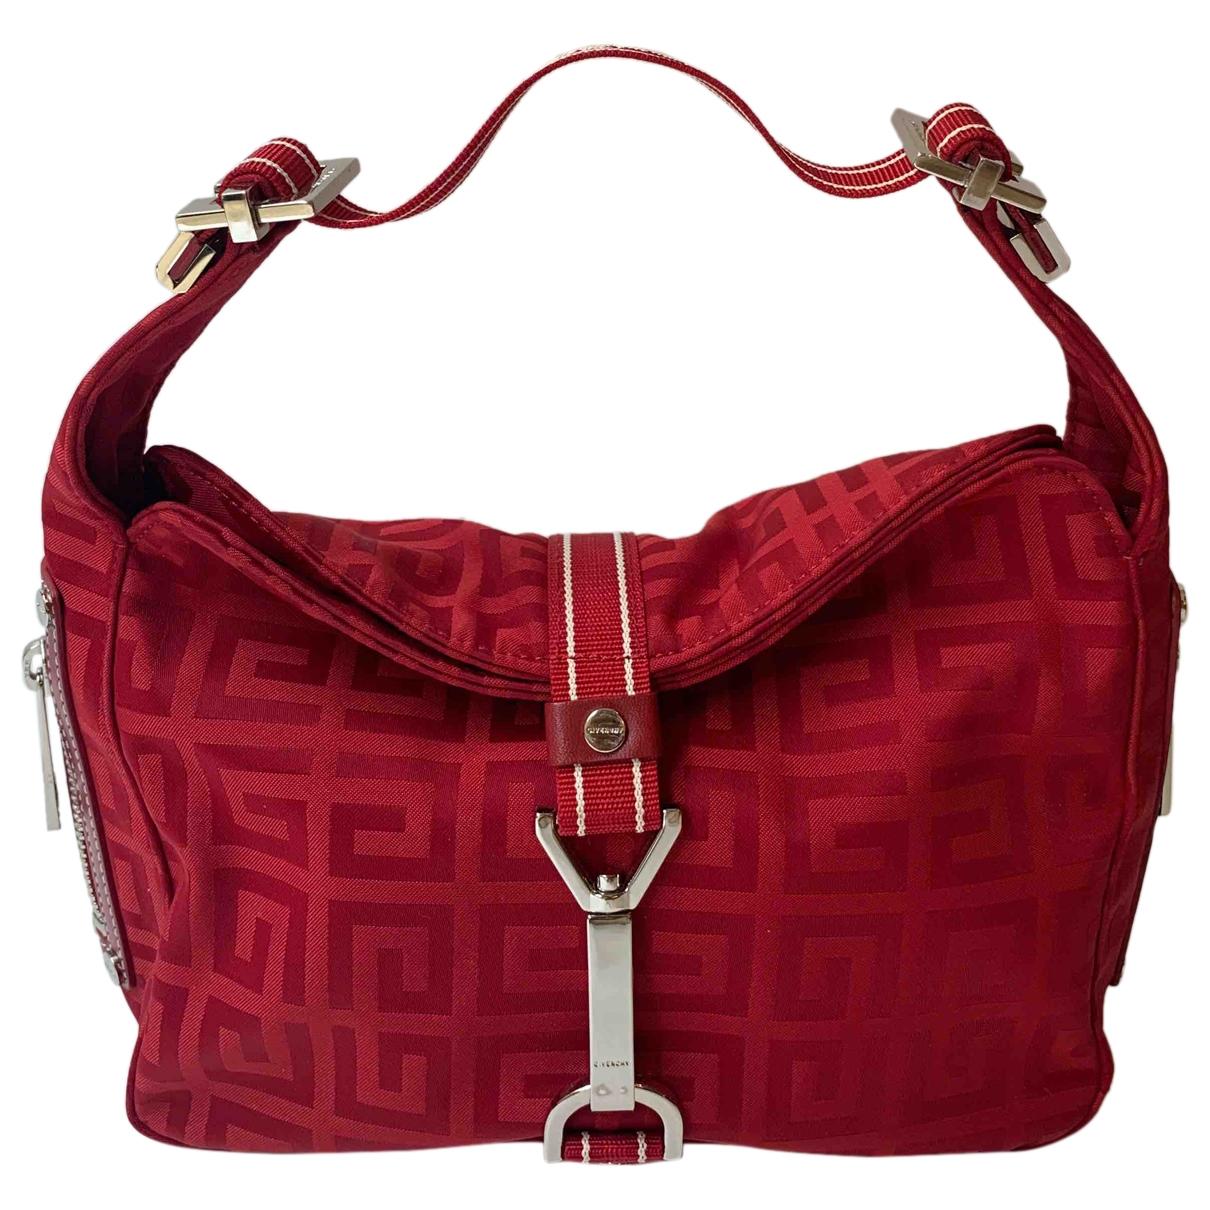 Givenchy \N Red Cloth handbag for Women \N